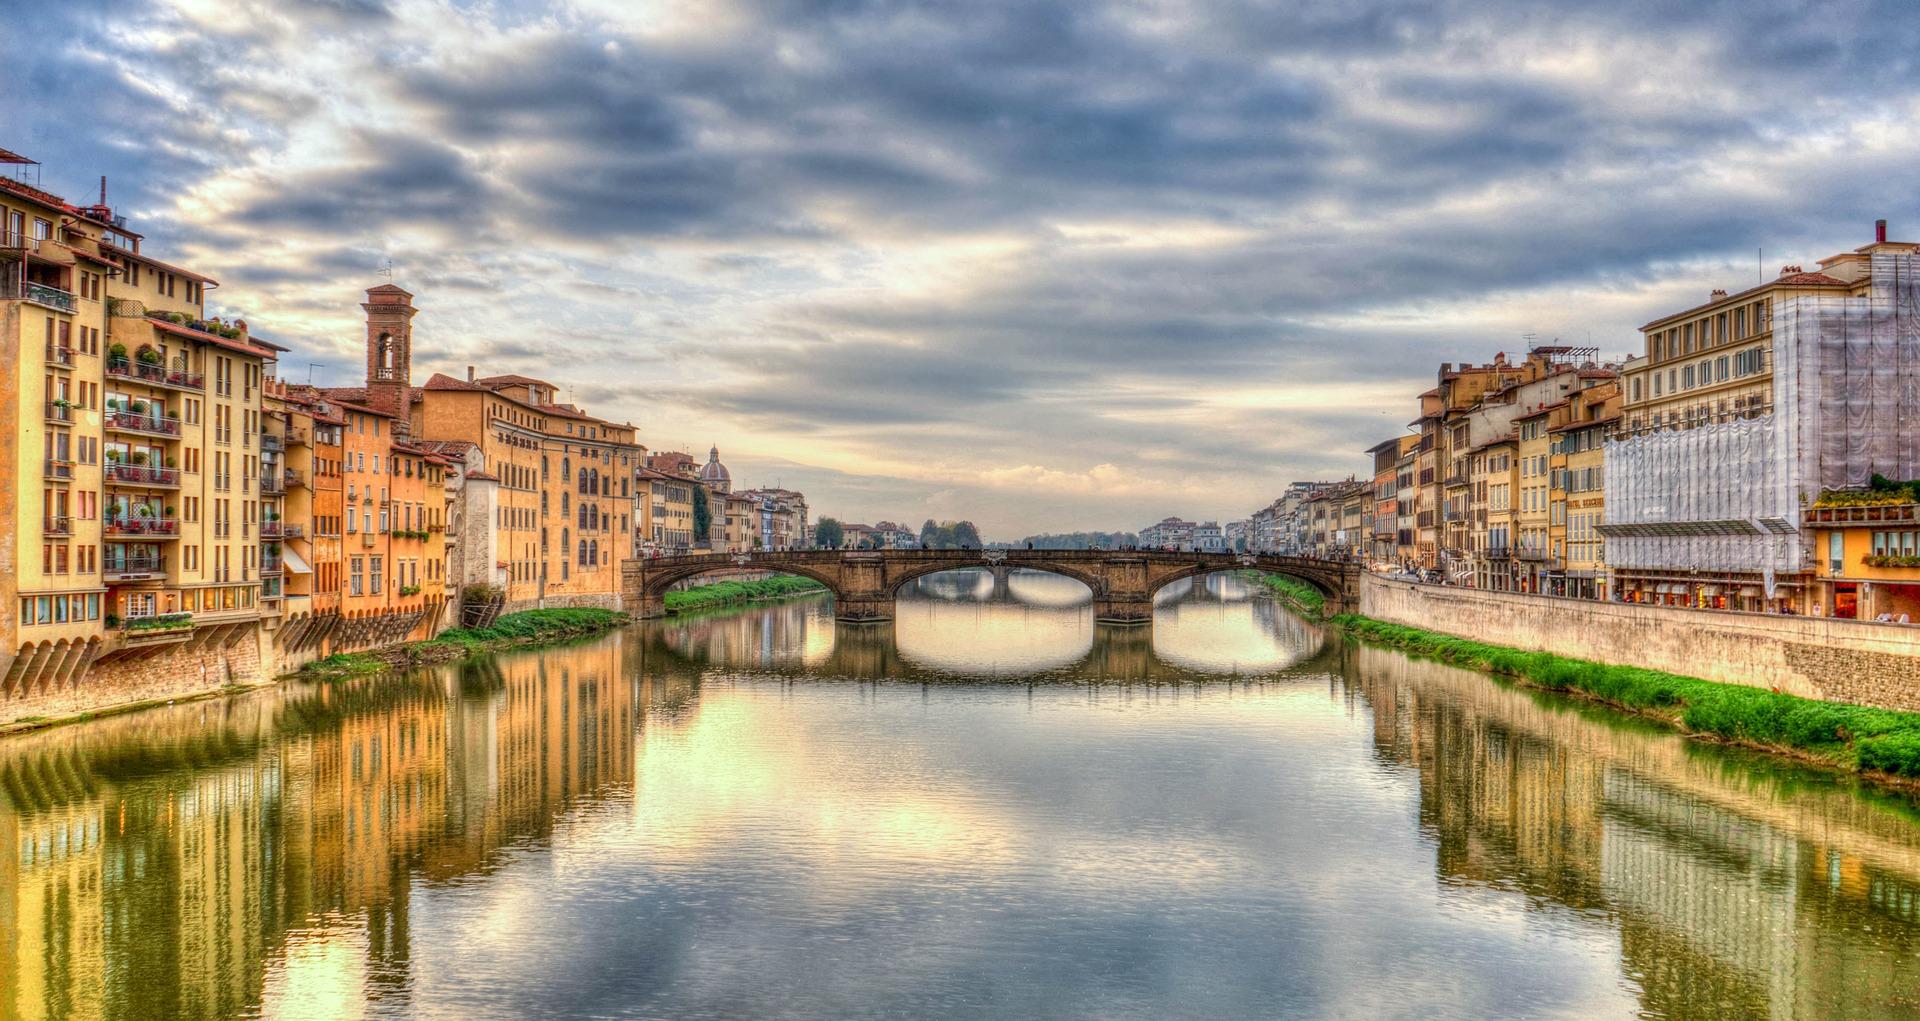 Emerald-Waterways-Arno-River   AardvarkCompare.com